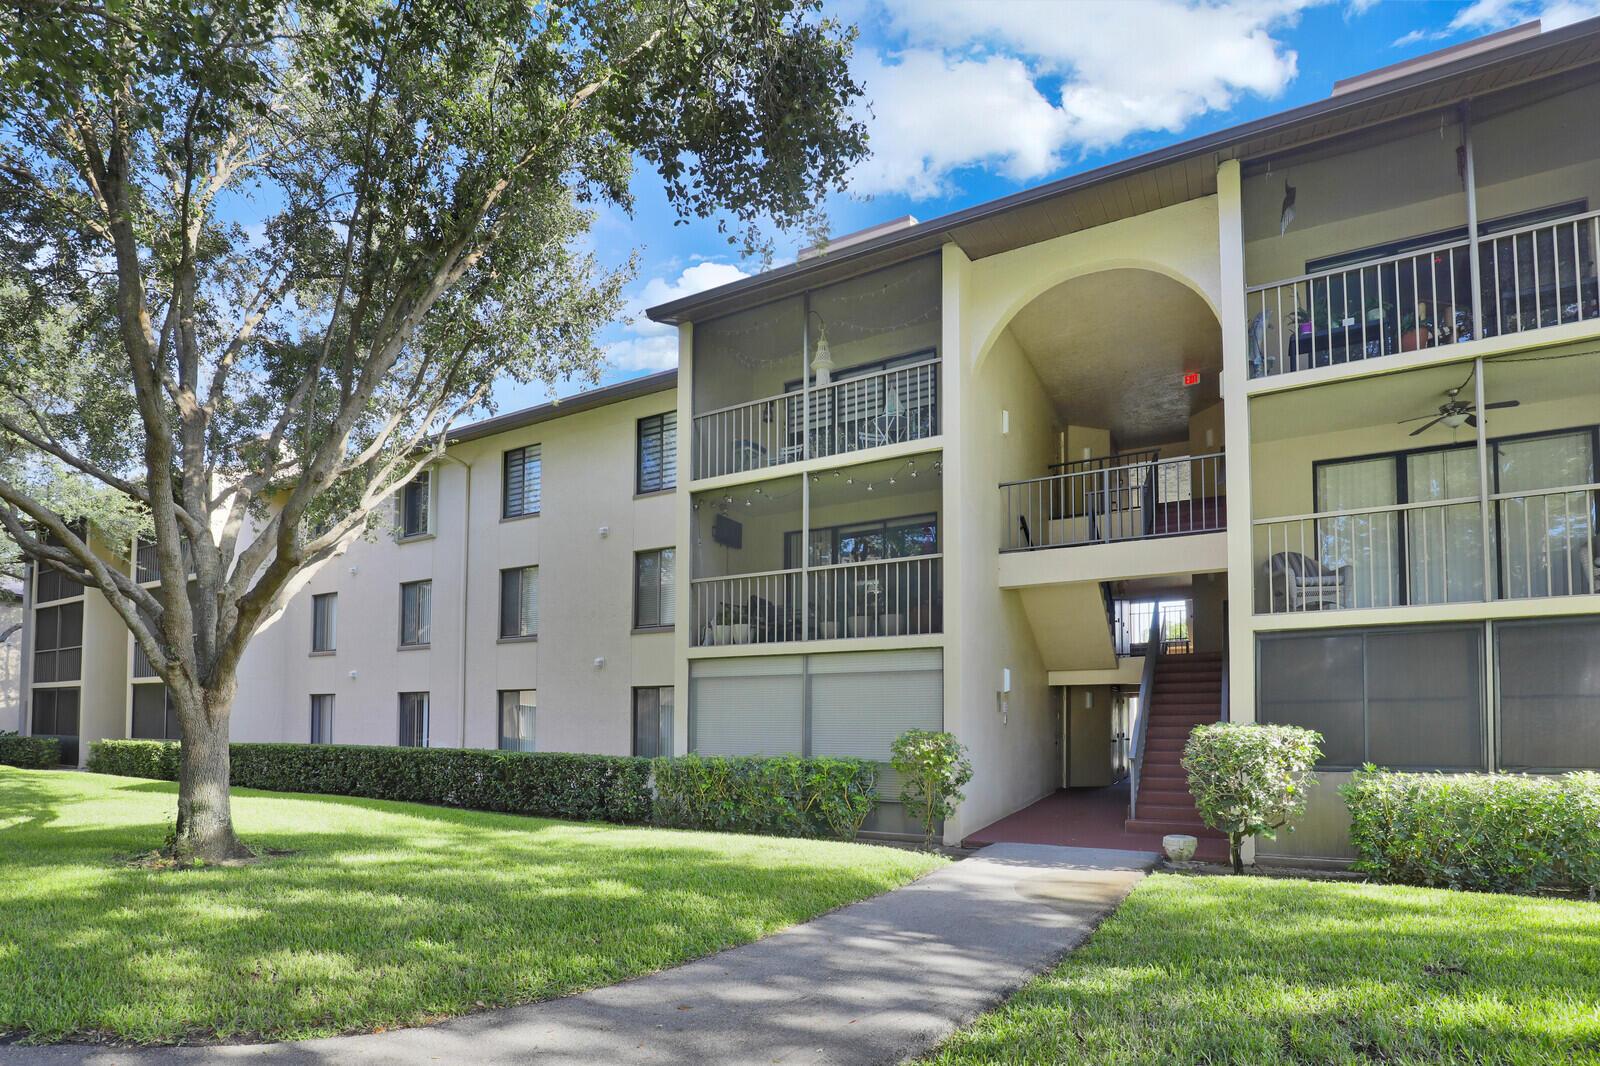 207 Foxtail Unit C1, Greenacres, Florida 33415